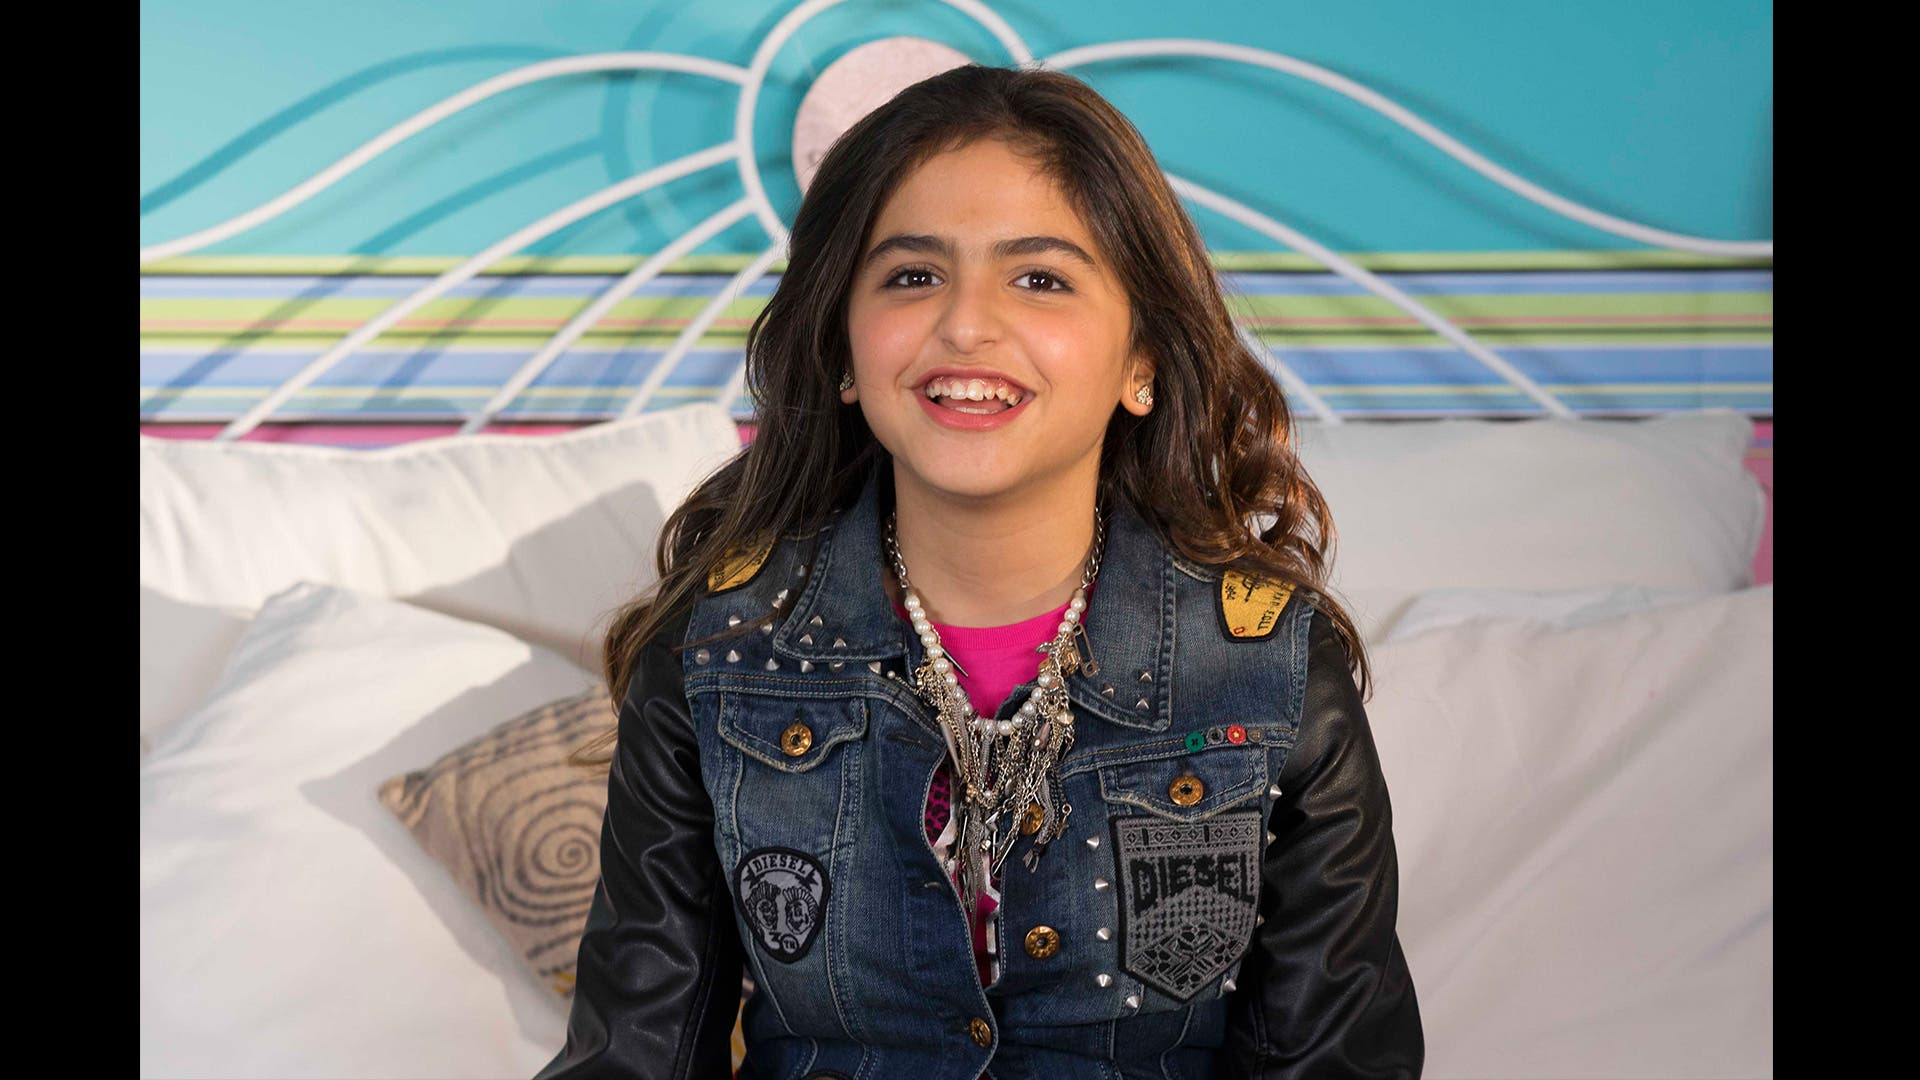 Hala al turk latest celebrity